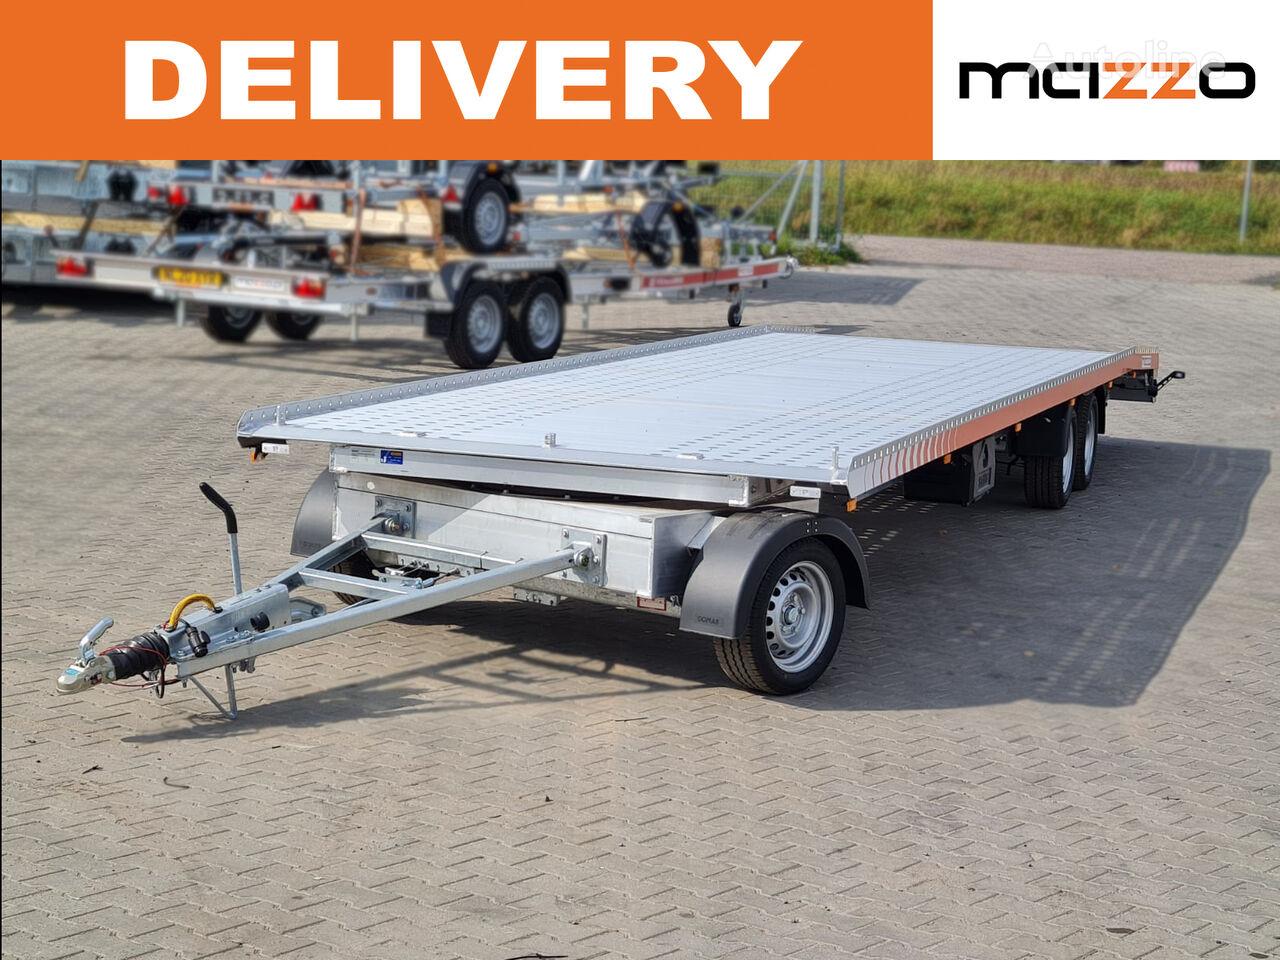 Turntable Transporter 850 x 210cm ALU GVW 3500kg PREMIUM remolque portacoches nuevo